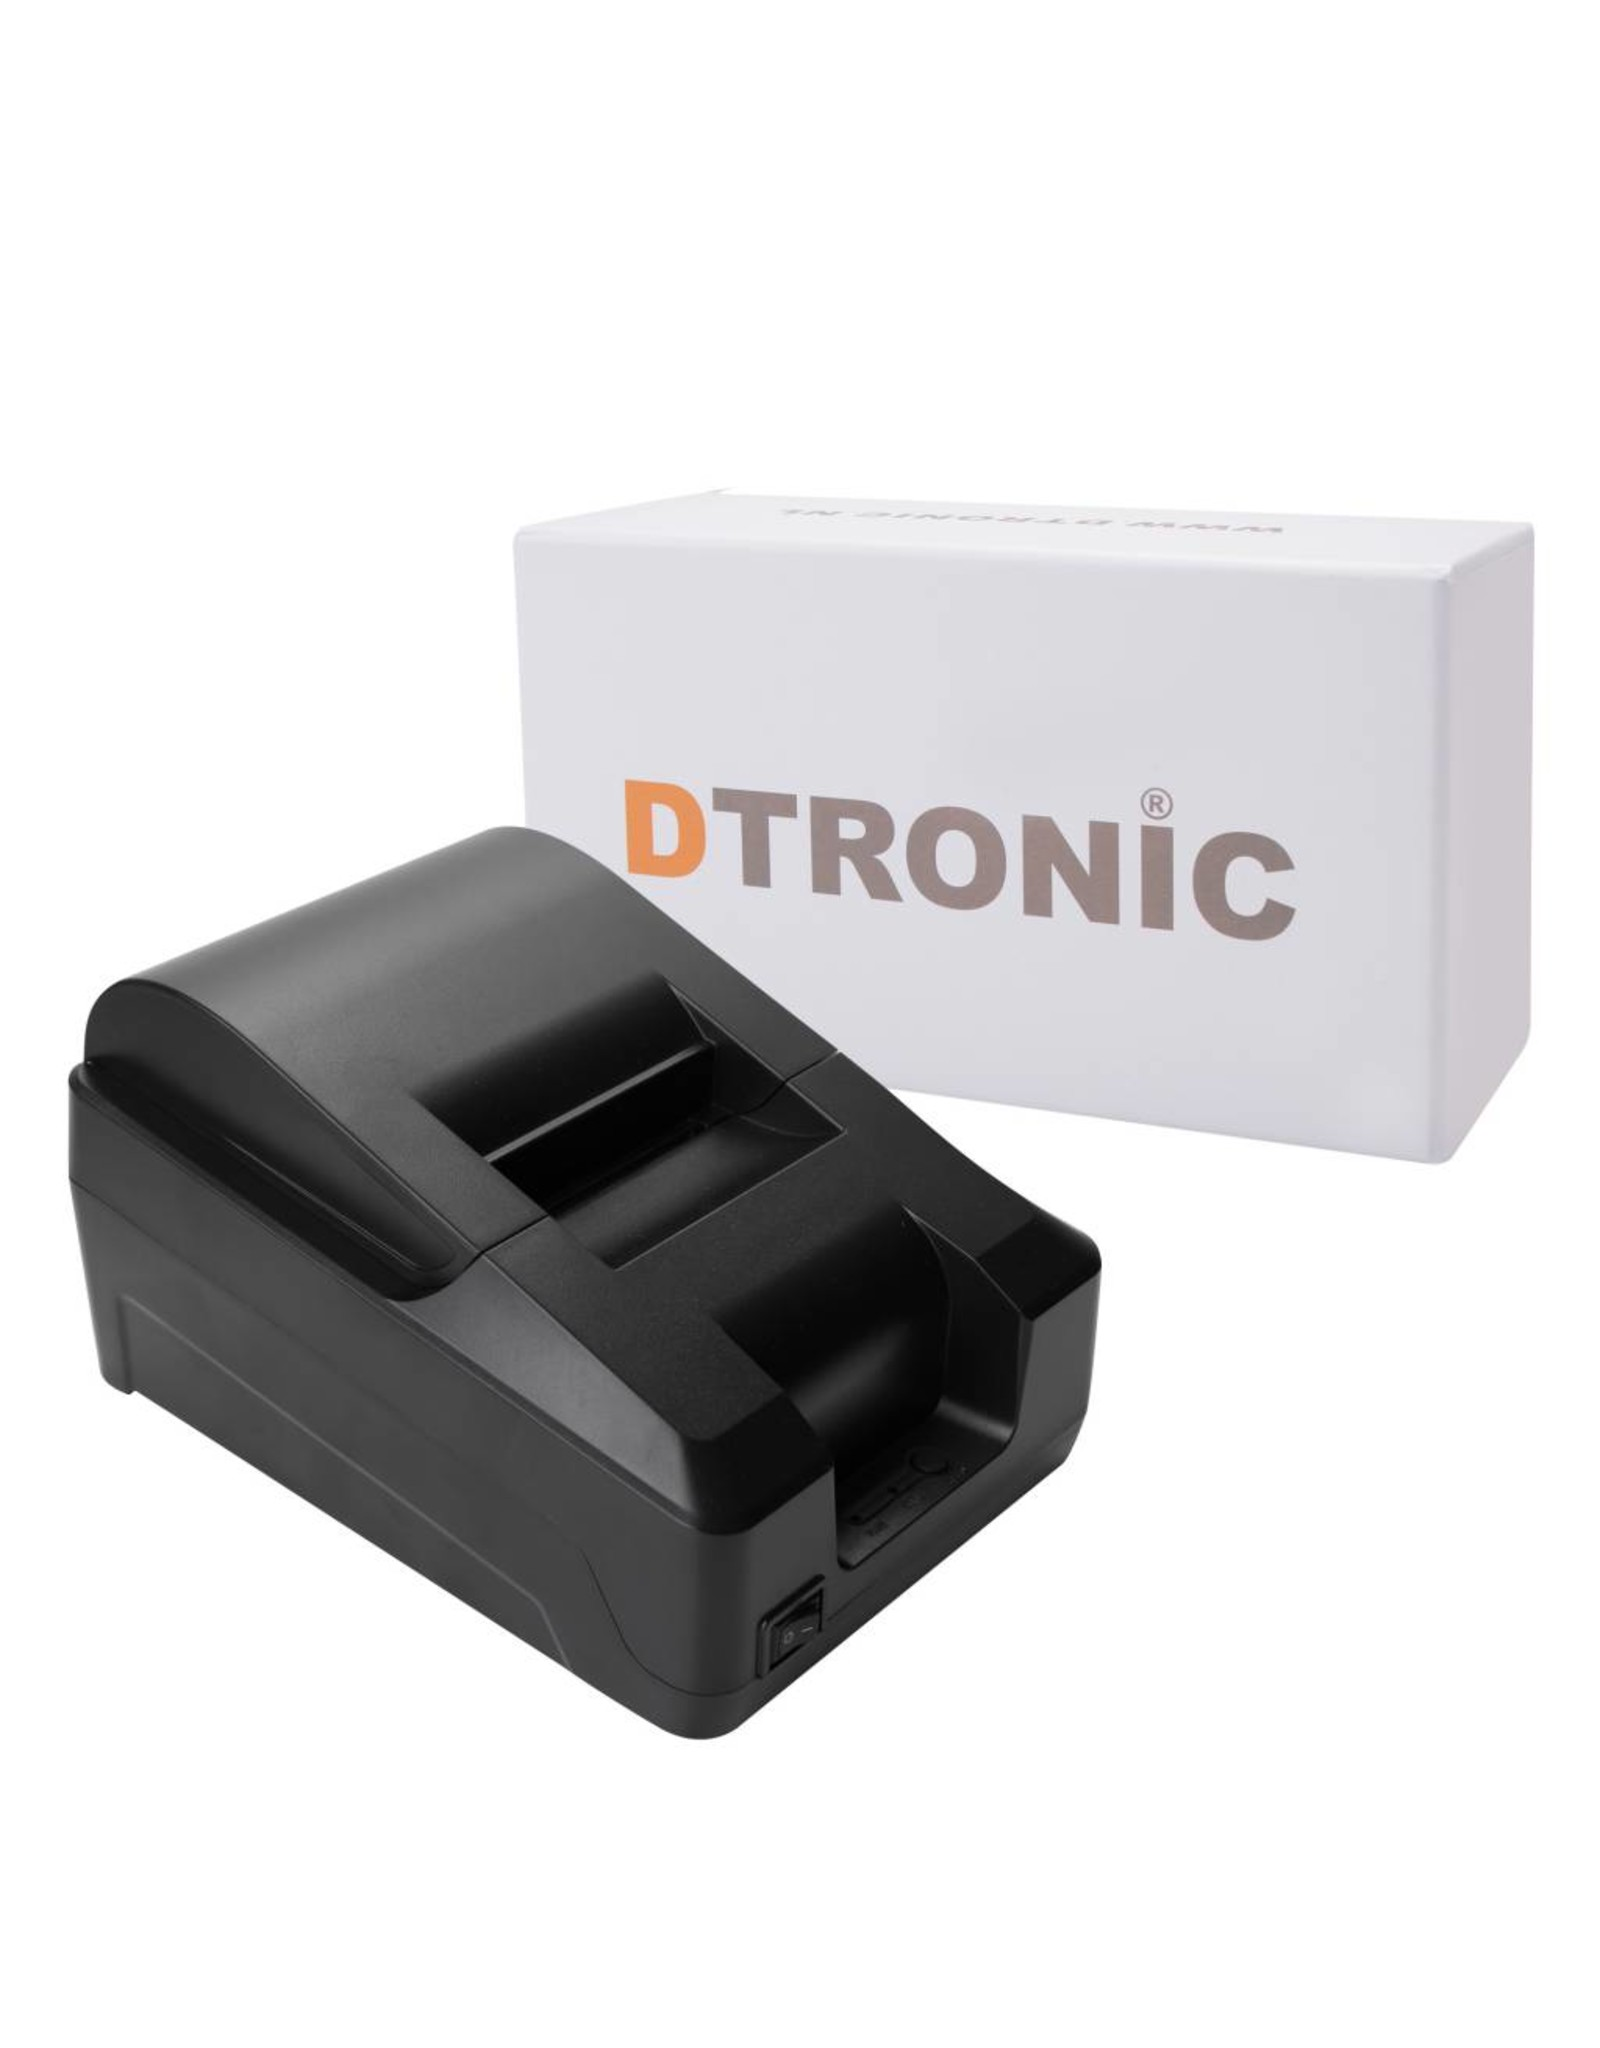 DTRONIC DTRONIC - 58T